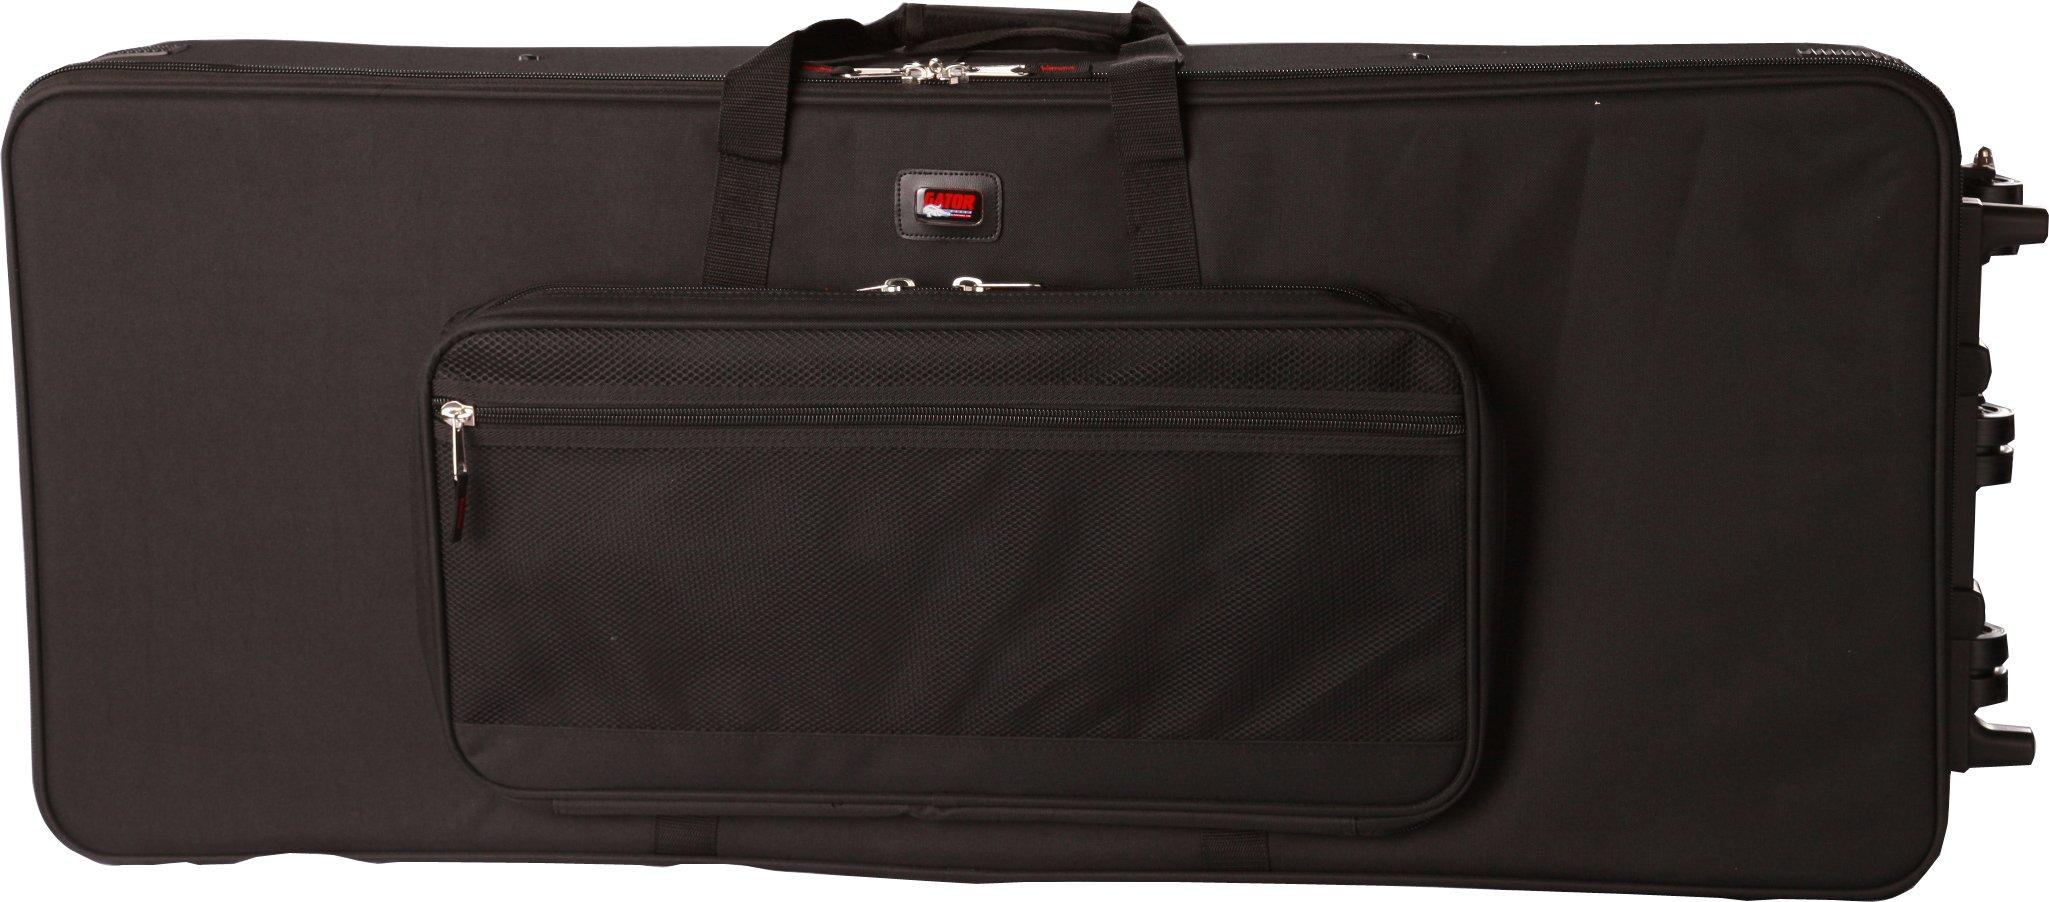 Gator GK88SLIM Slim Line 88-Note Lightweight 54 x 15 x 6 Inches Keyboard Case on Wheels